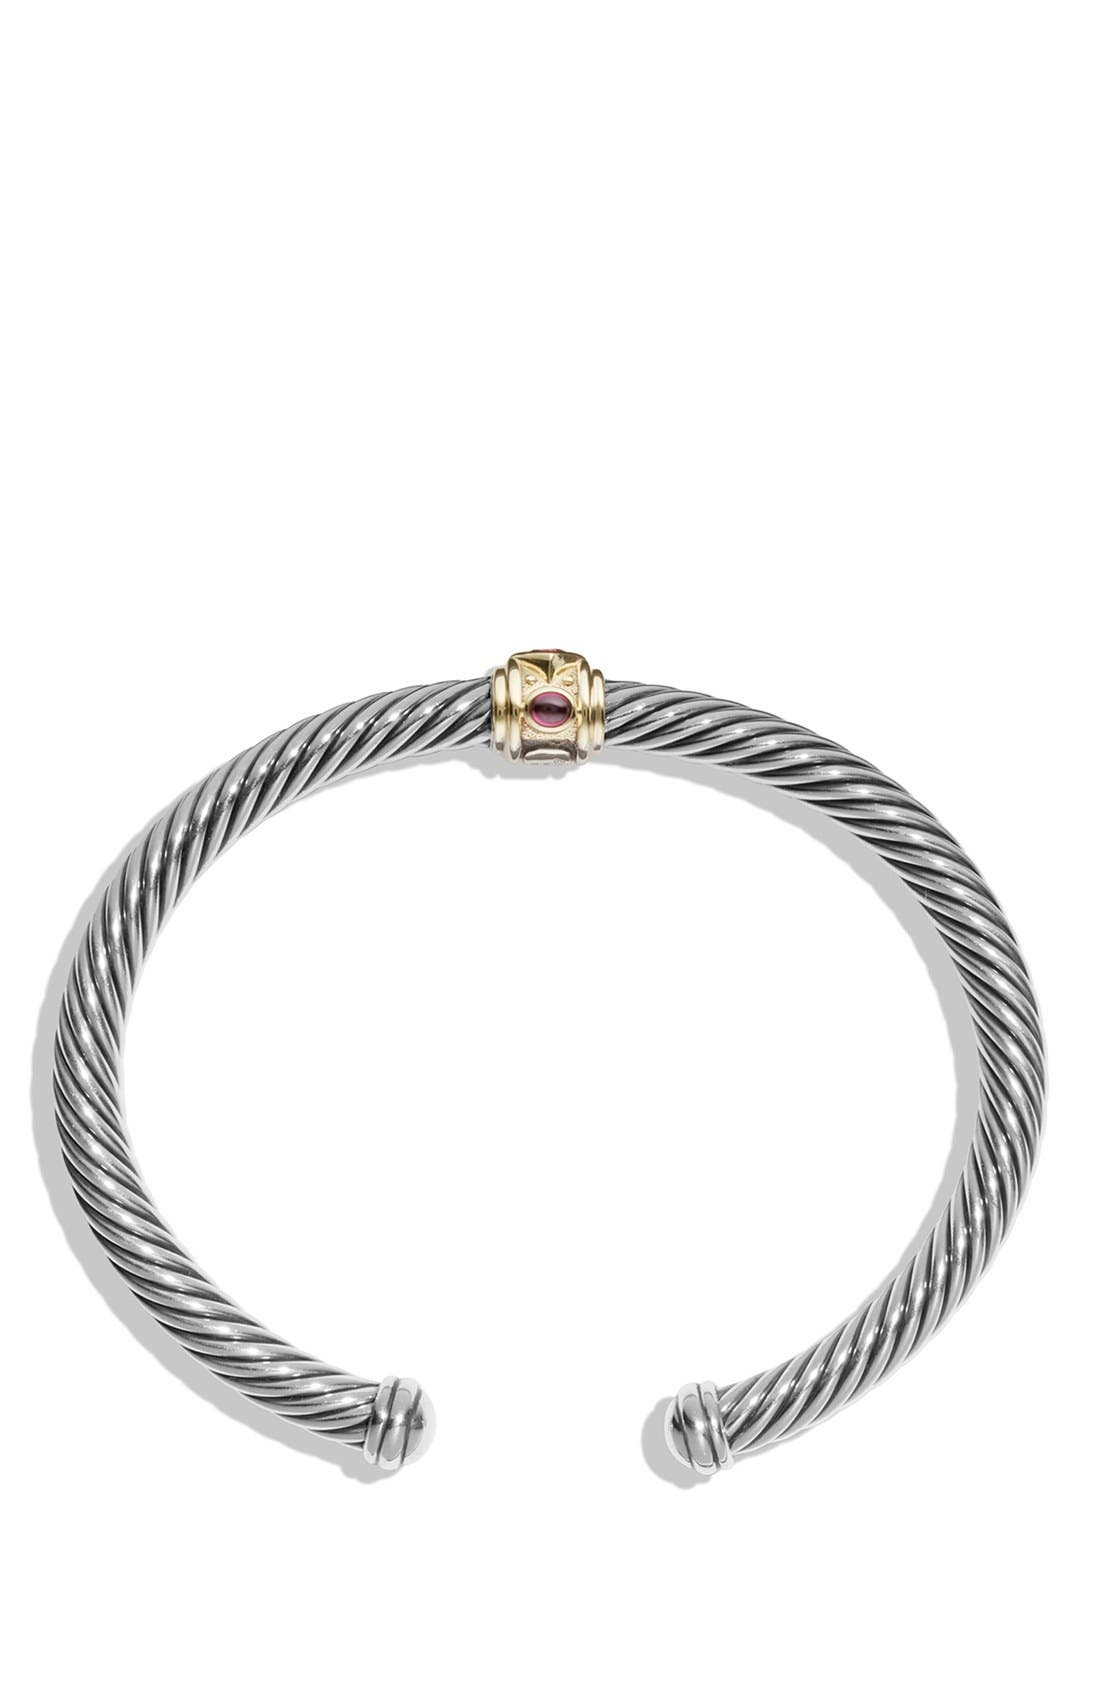 Renaissance Bracelet with Semiprecious Stones & 14K Gold, 5mm,                             Alternate thumbnail 2, color,                             PINK TOURMALINE